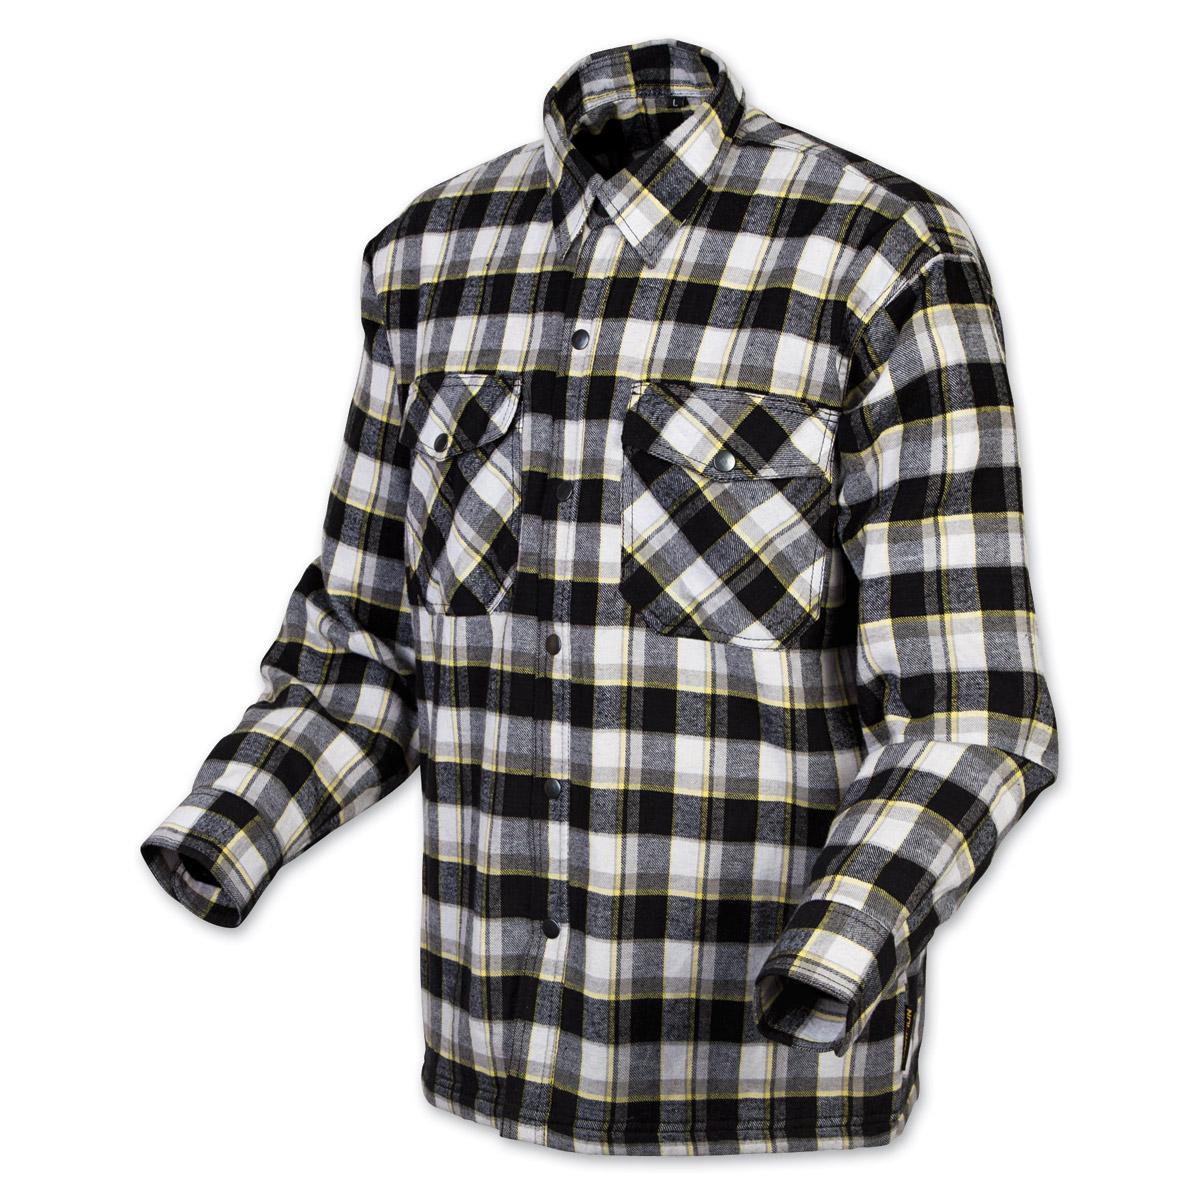 Scorpion EXO Men's Covert Black/Yellow Flannel Shirt